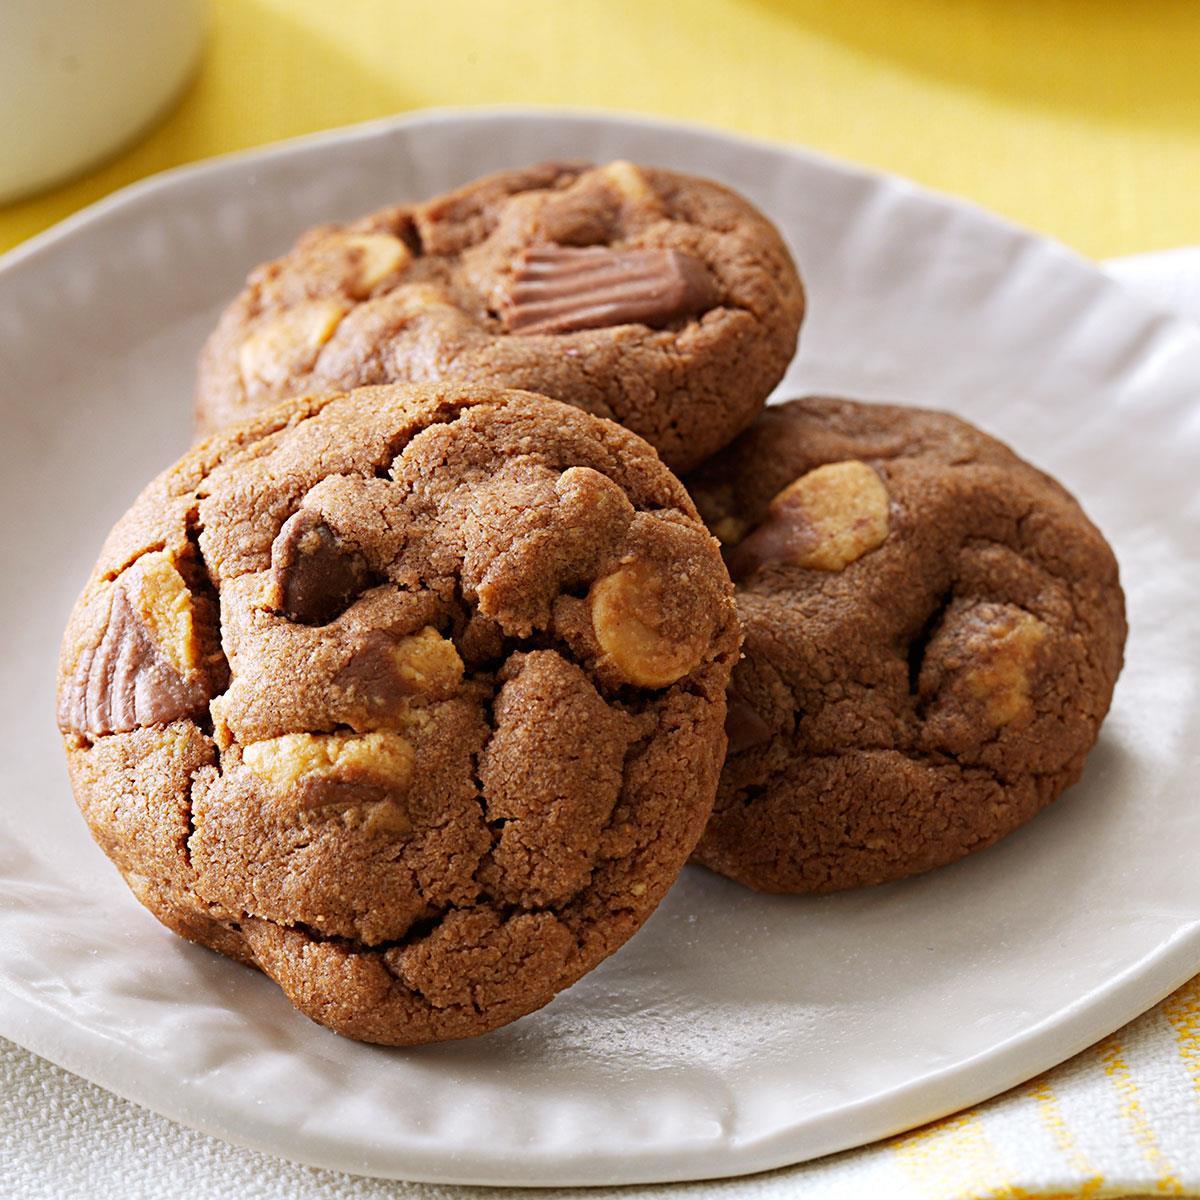 Peanut Butter Chocolate Cookies  Chocolate Peanut Butter Cup Cookies Recipe